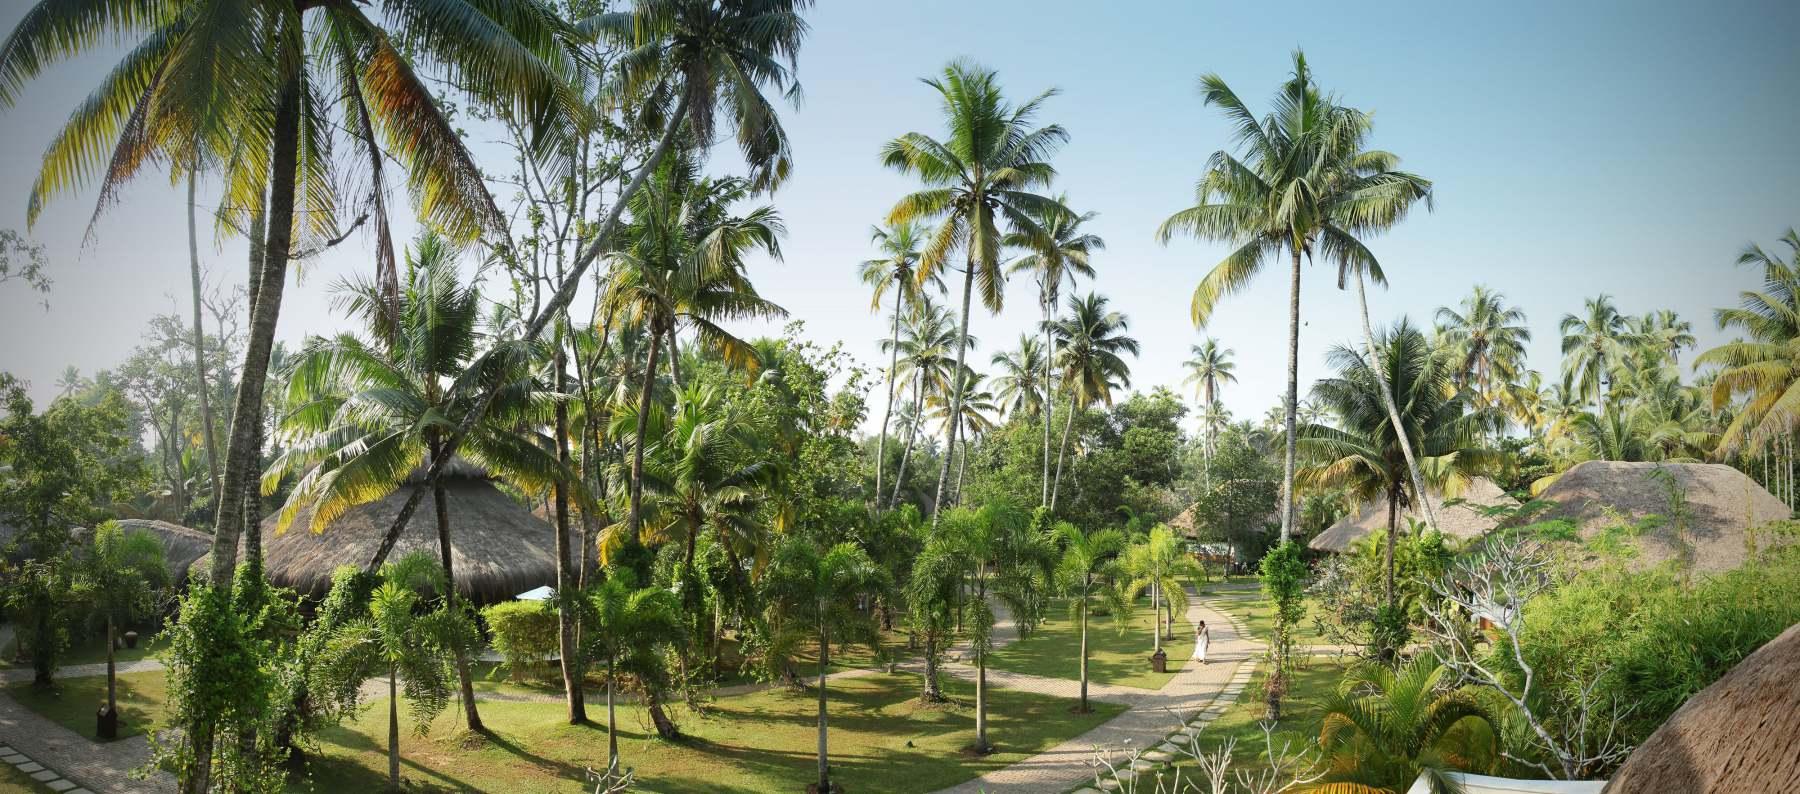 Carnoustie Goa